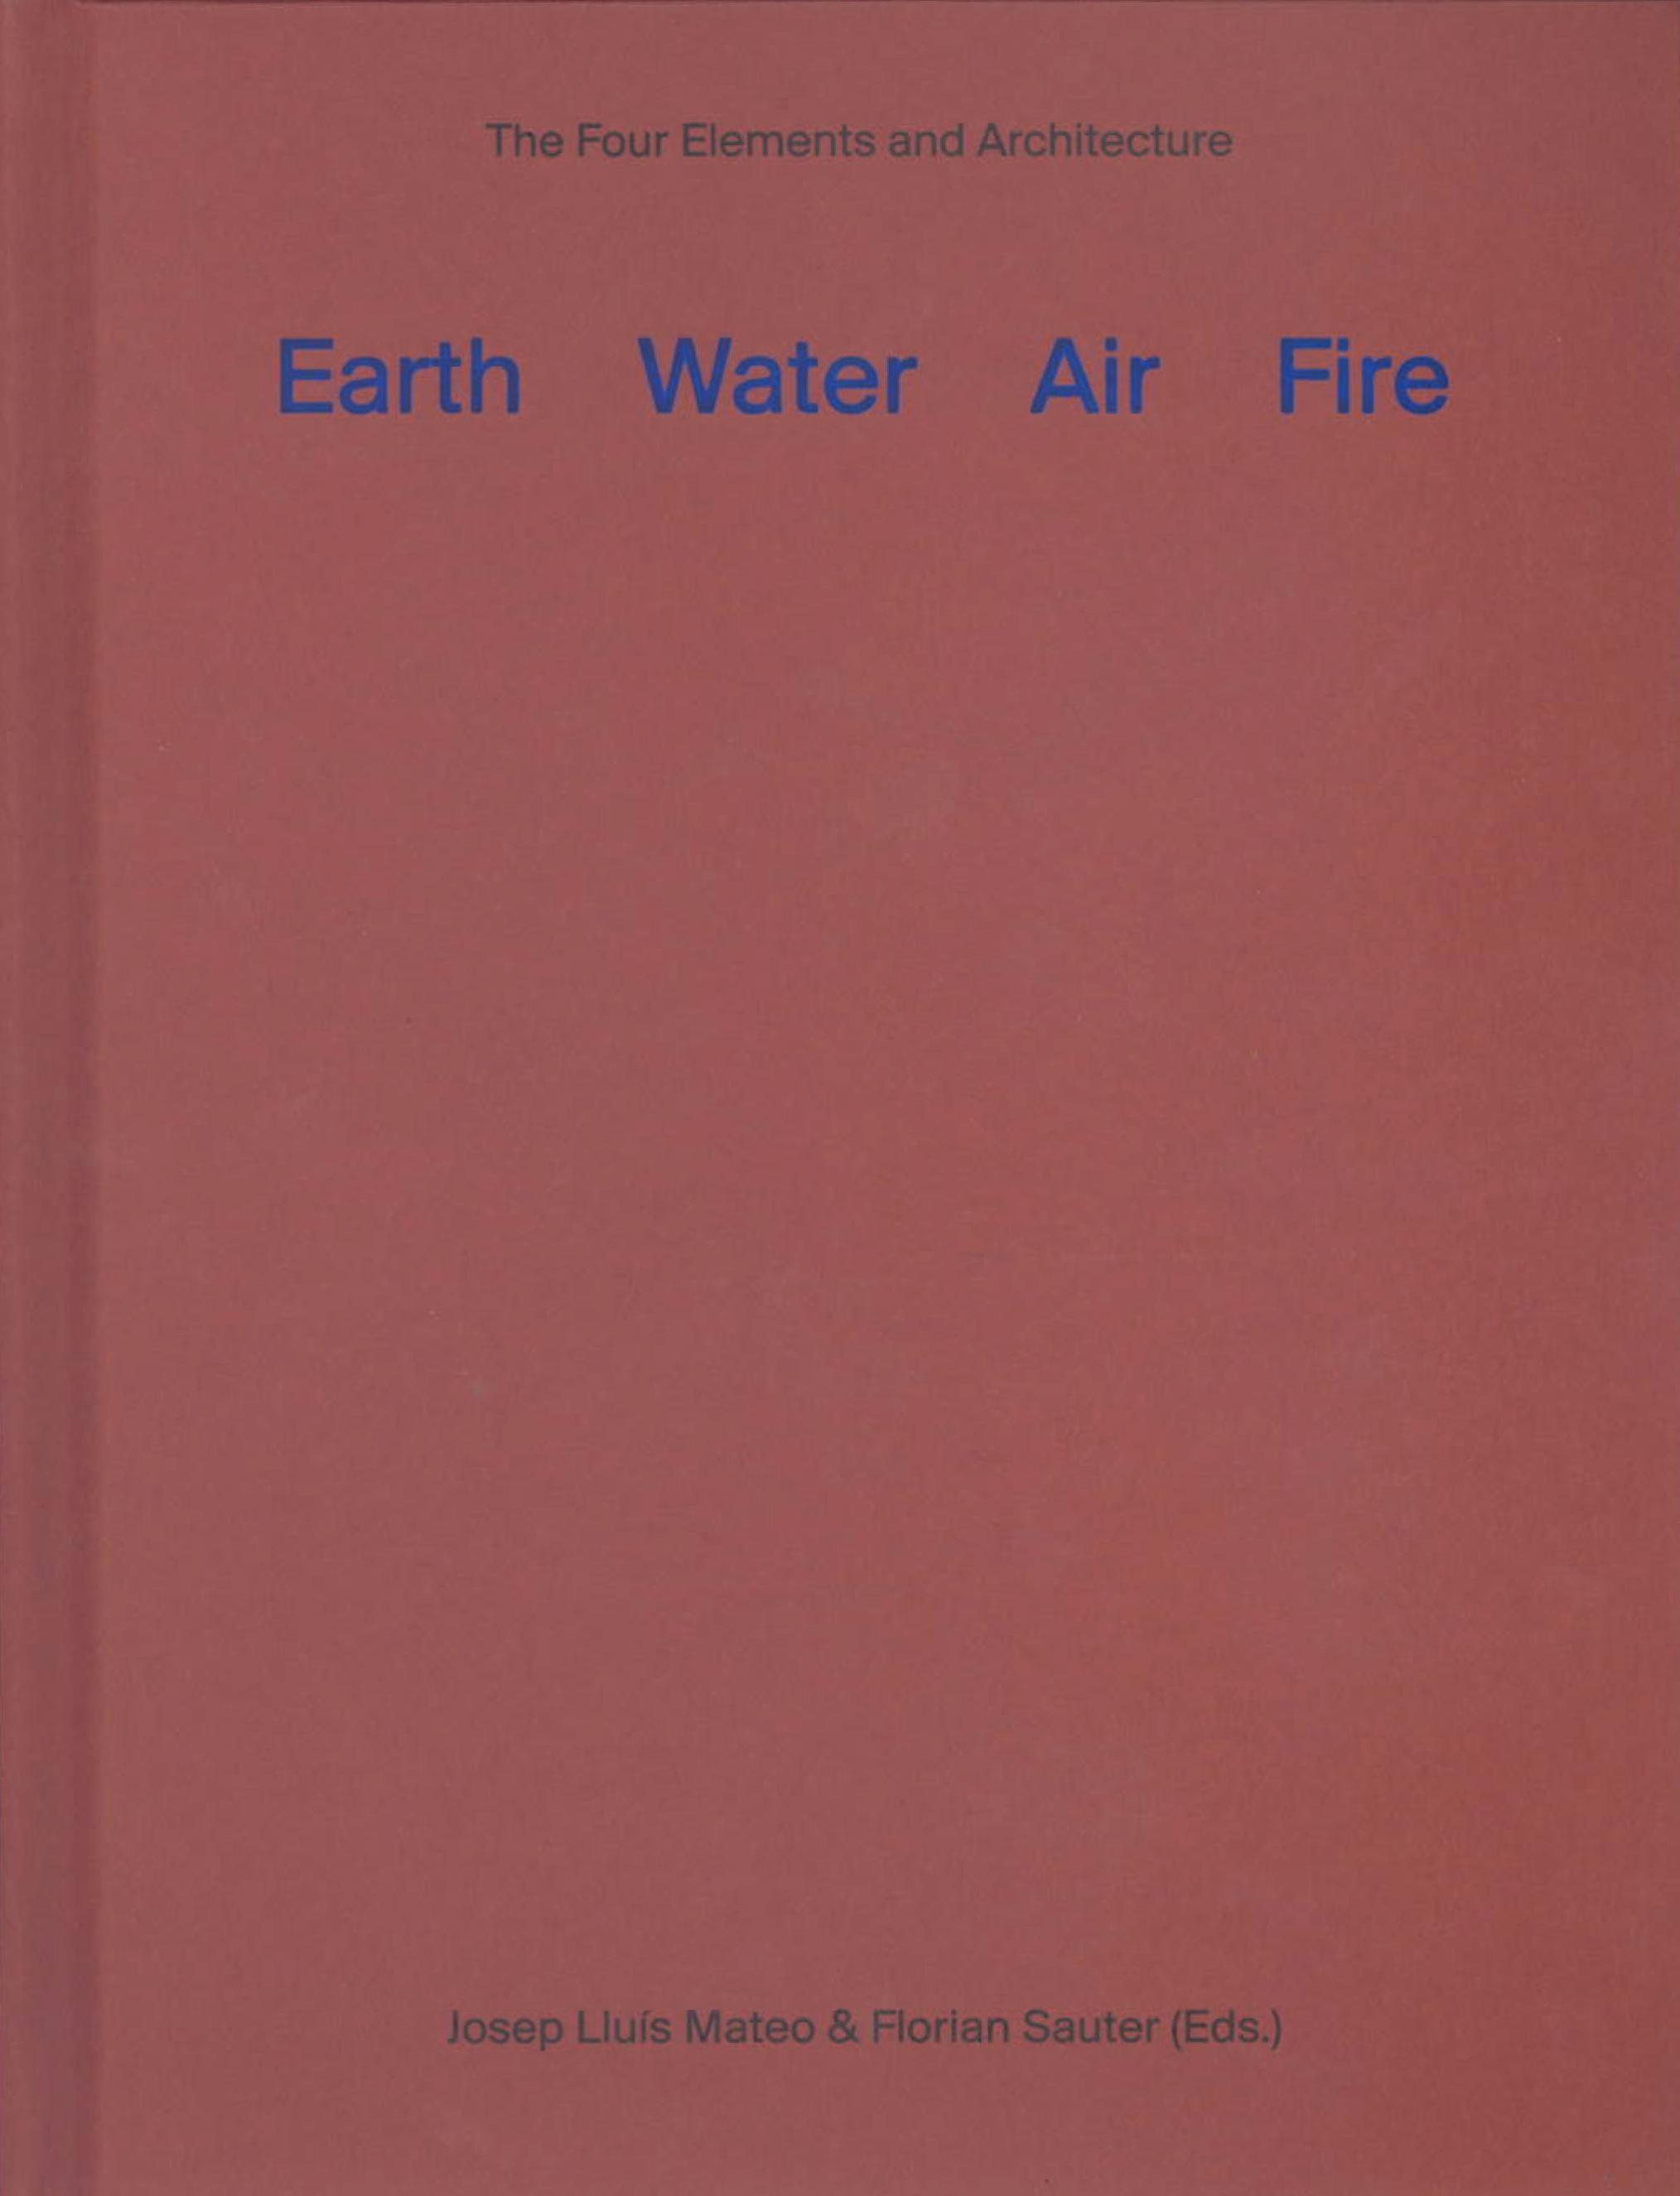 Earth, Water, Air, Fire